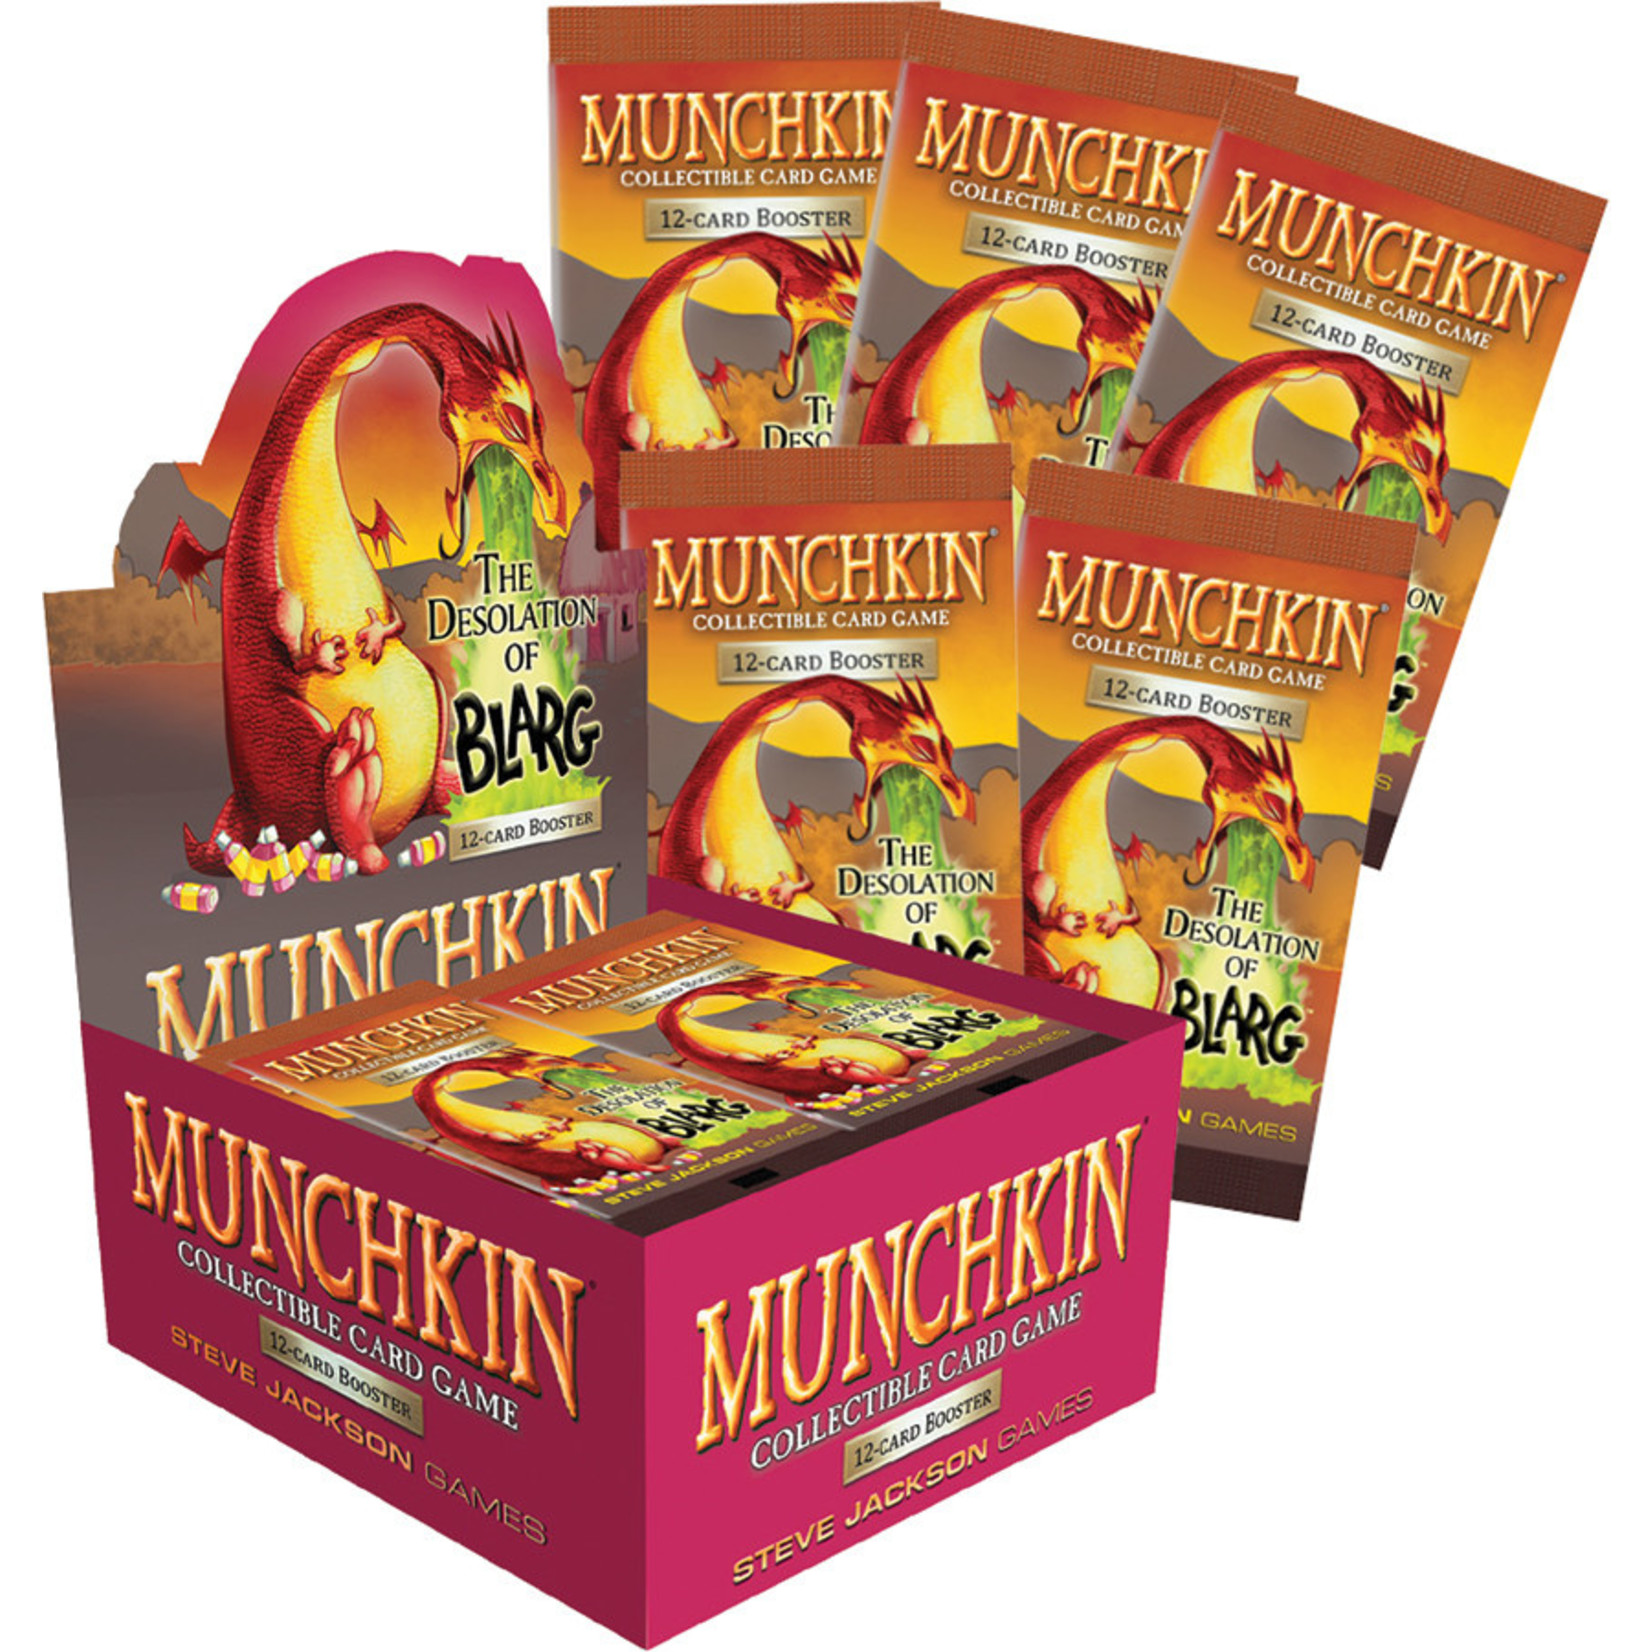 Steve Jackson Games Munchkin CCG: The Desolation of Blarg Booster